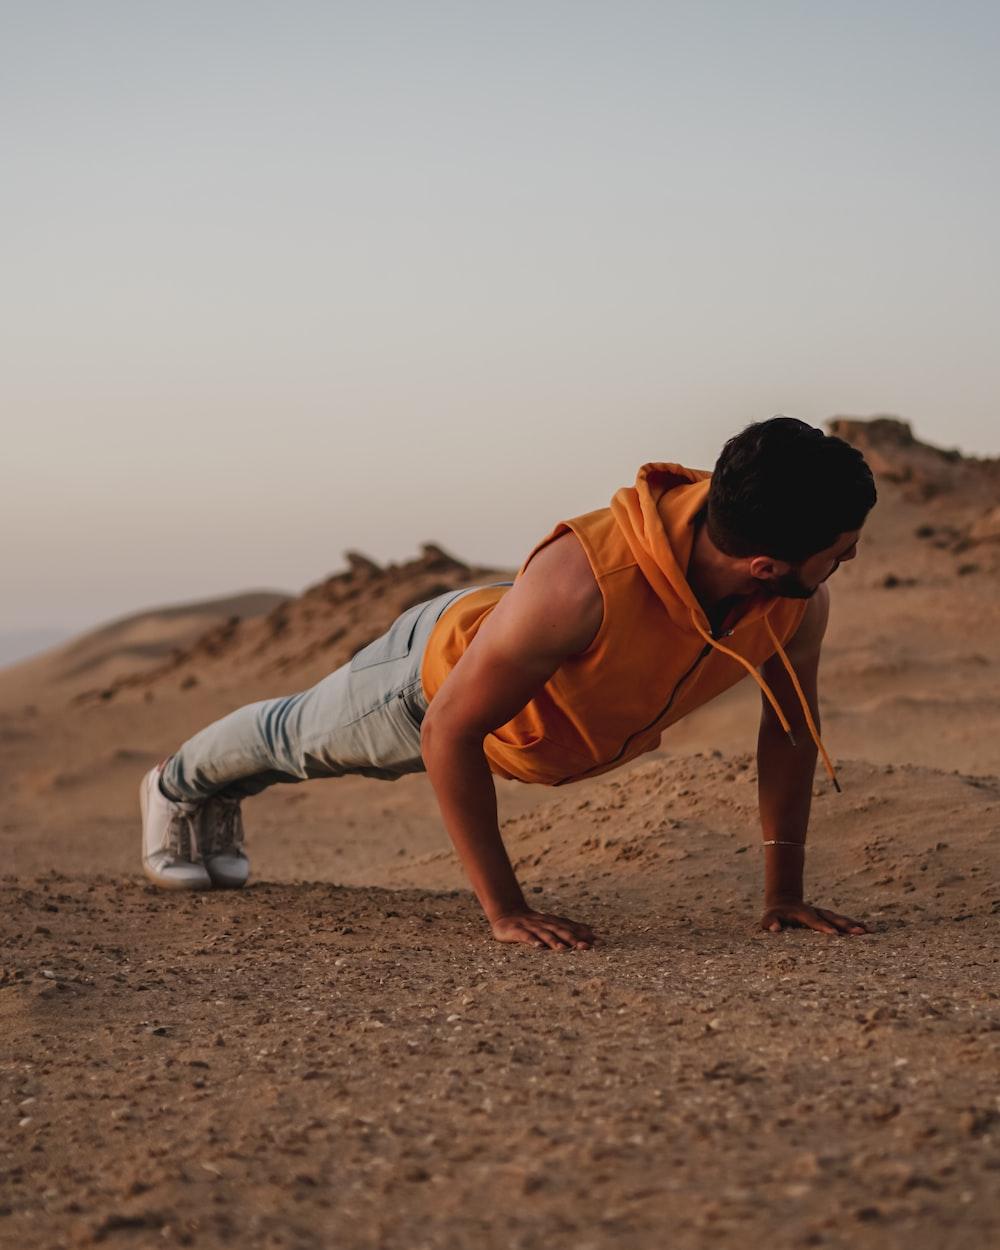 man pushes up on ground